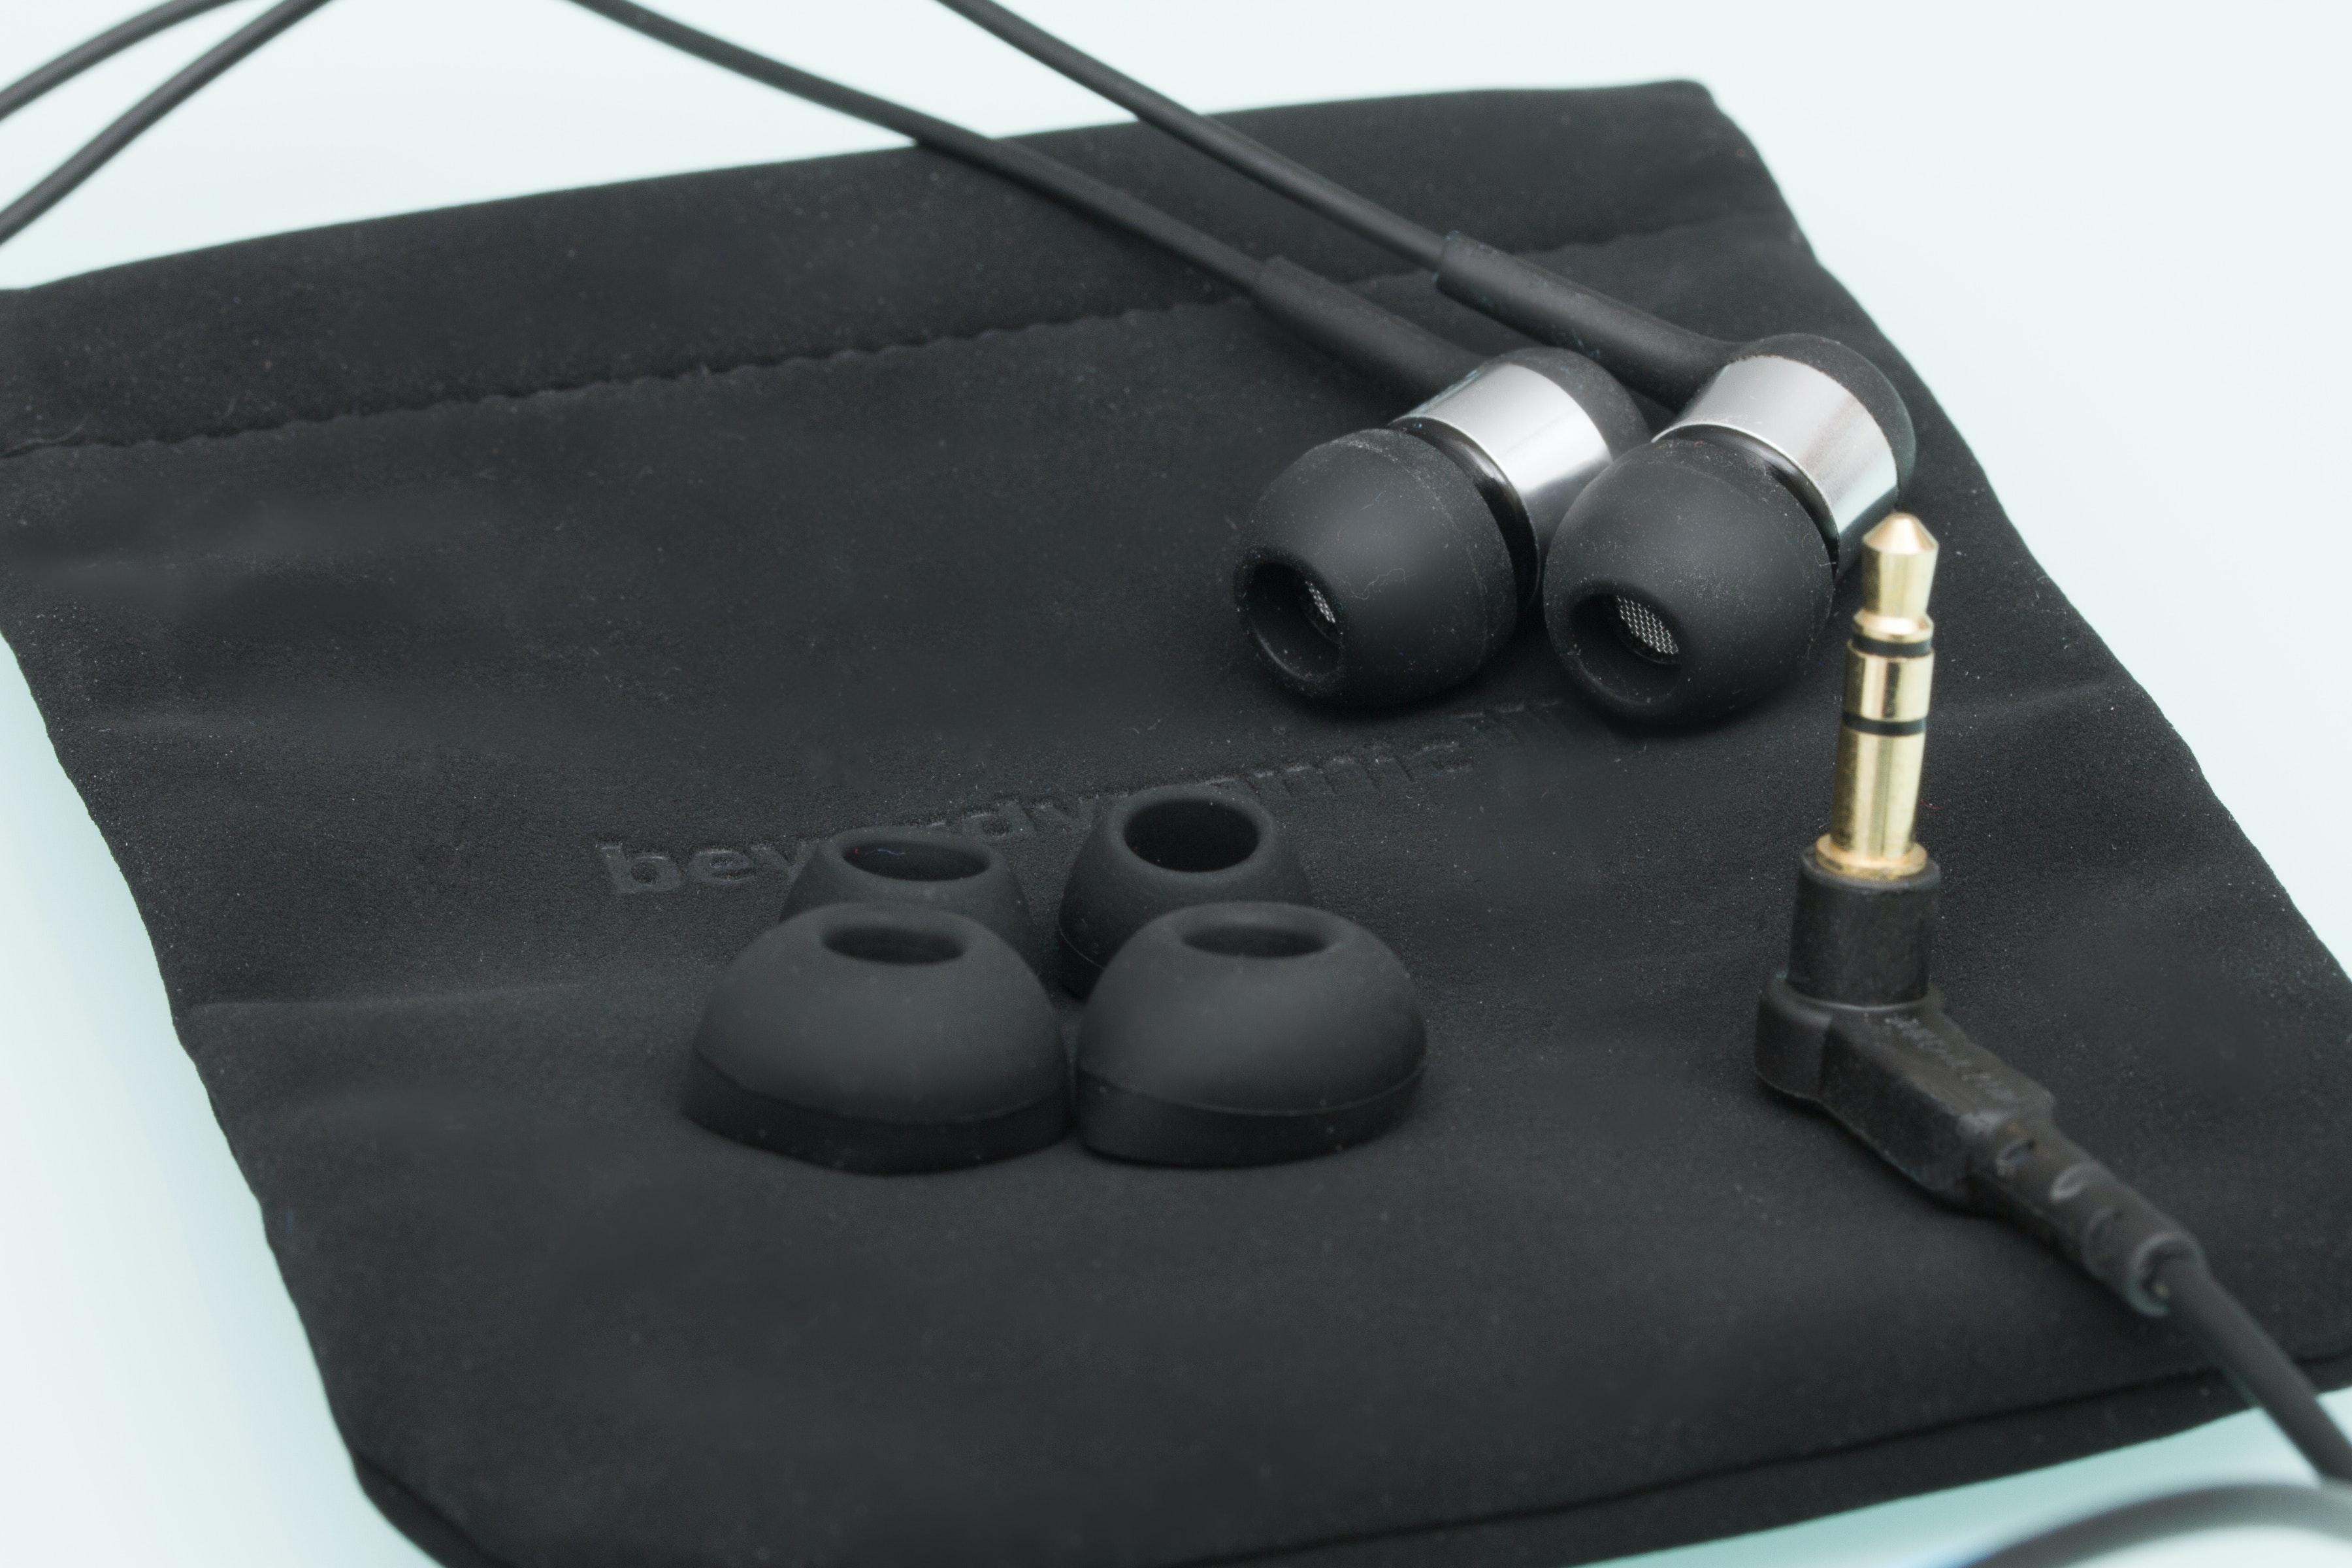 Beyerdynamic DTX 102 iE Earphones